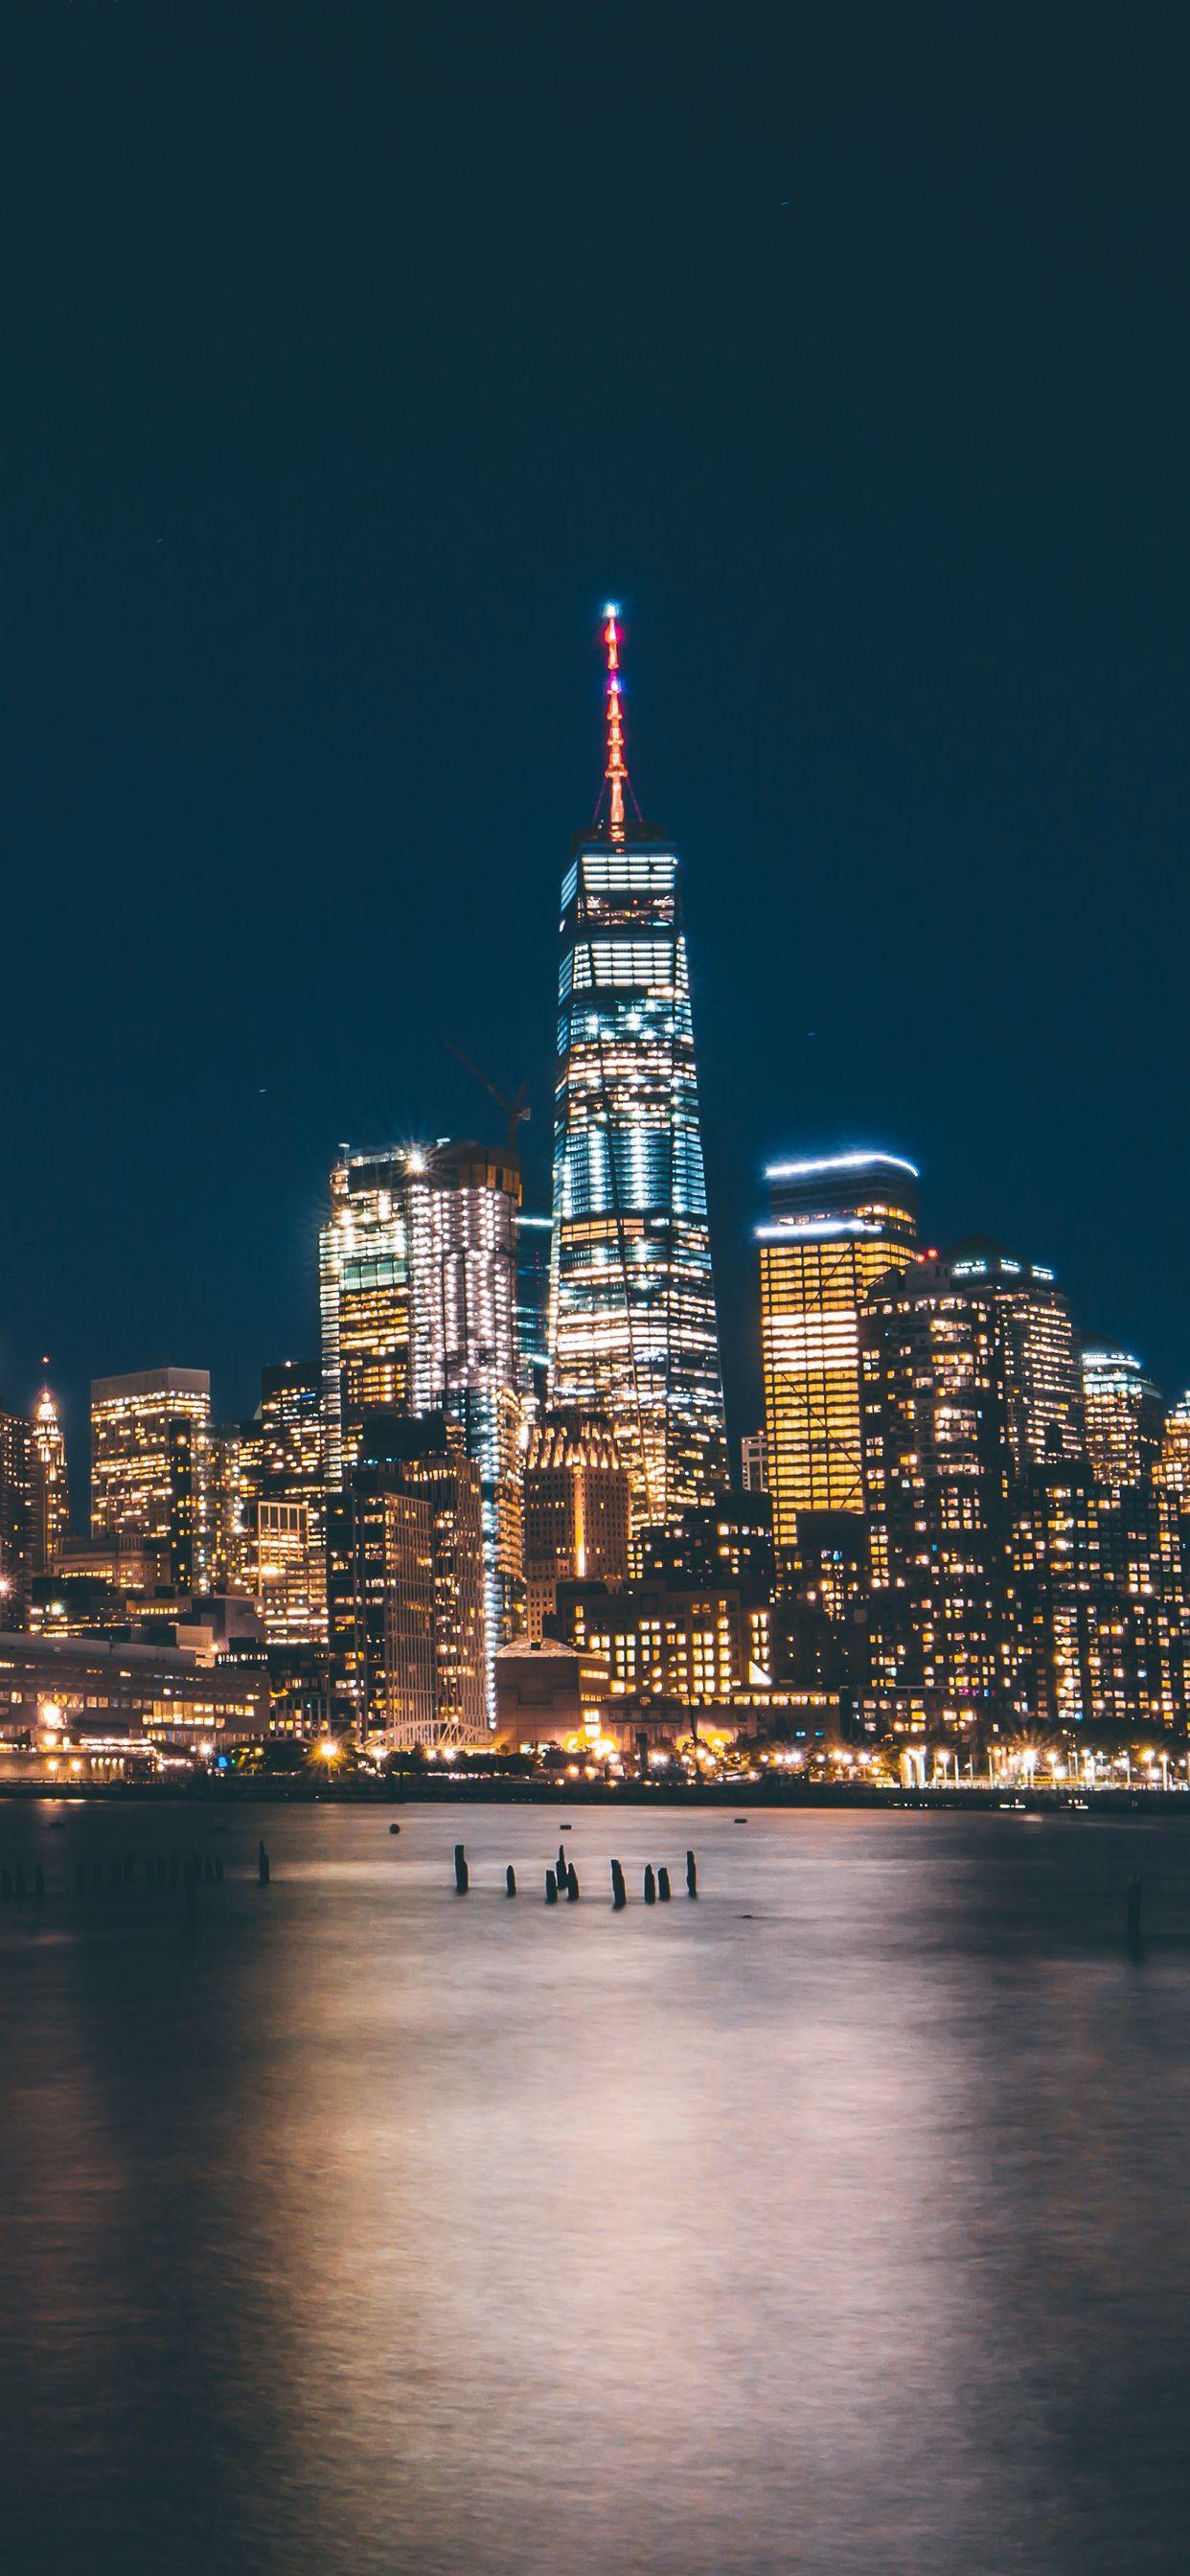 New York Skyline Iphone Wallpapers Top Free New York